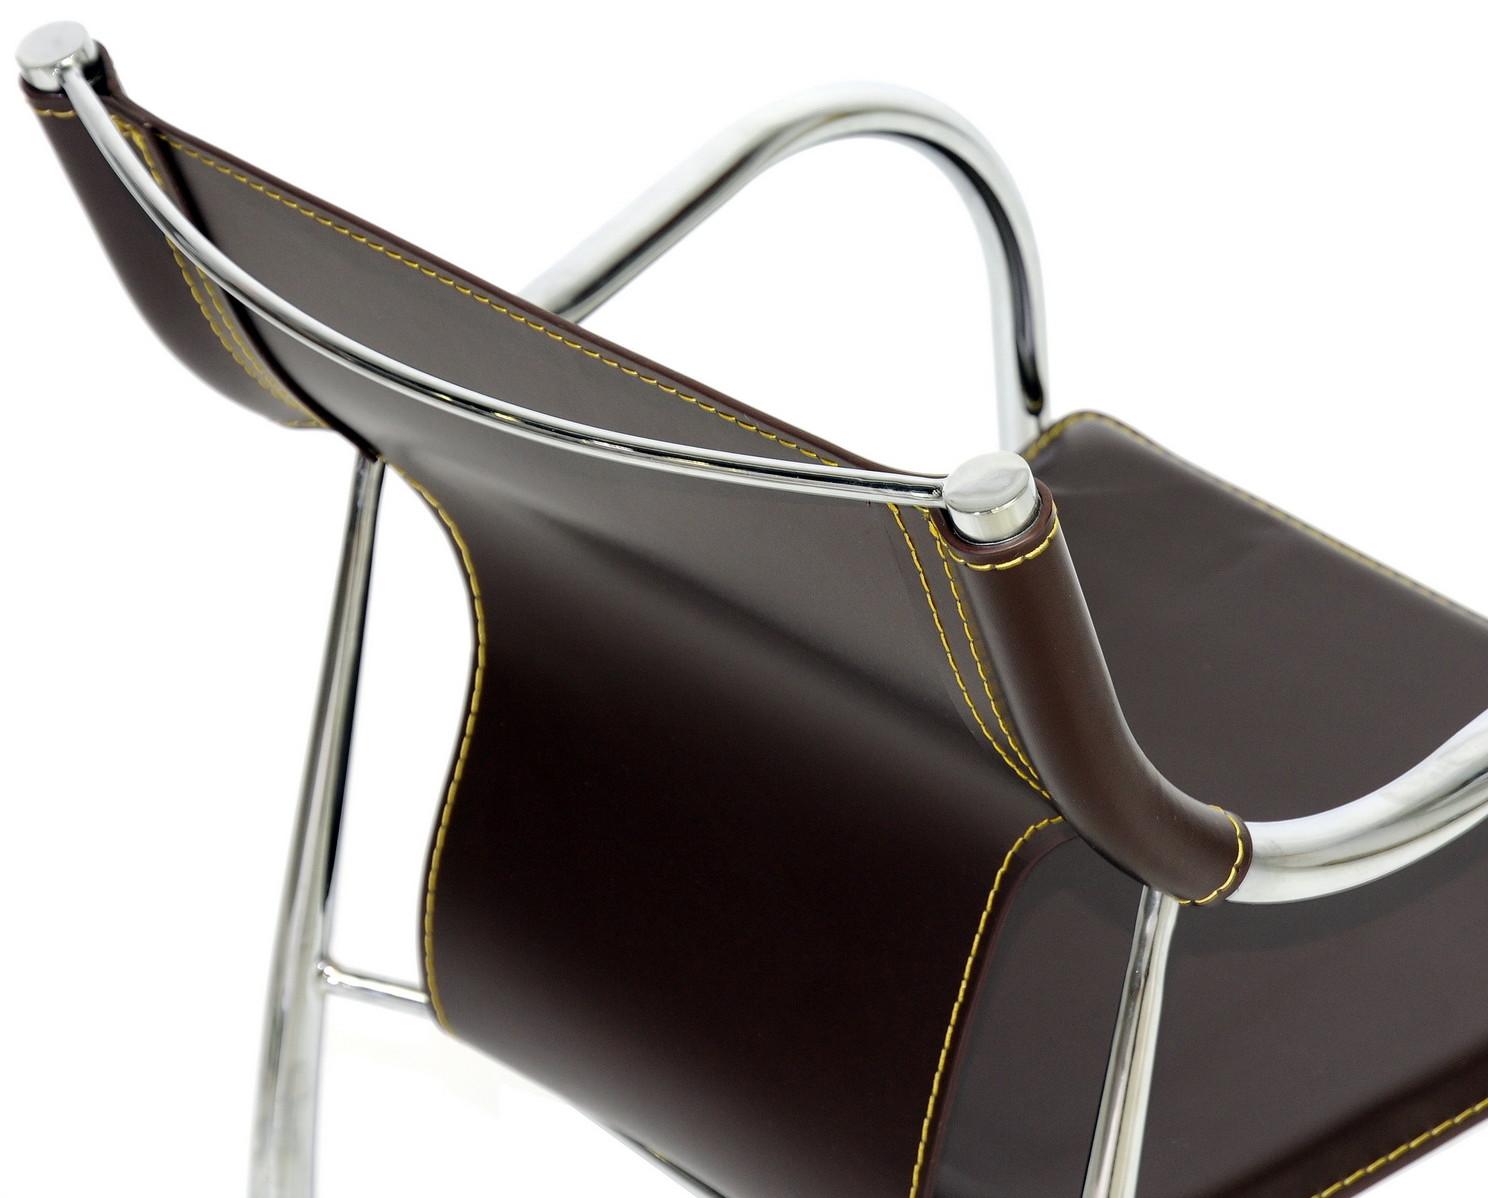 carina-brown-chair-close-up.jpg